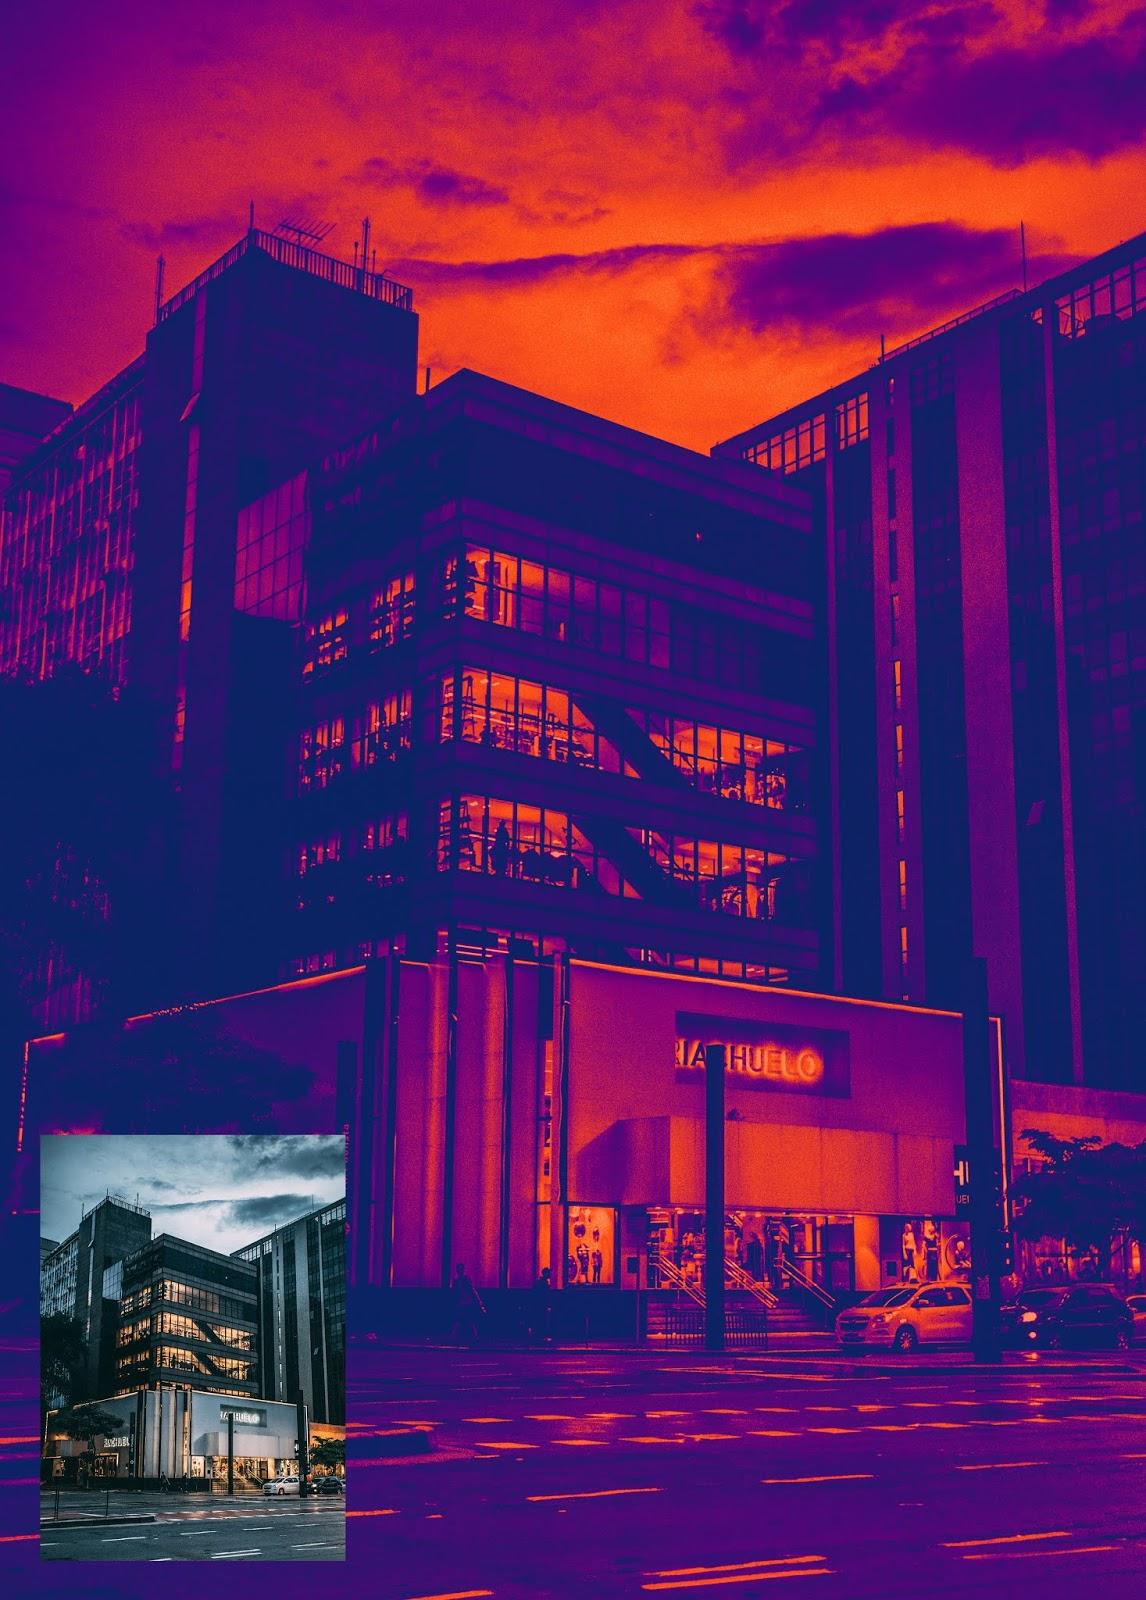 Free Download Cyberpunk 01 Photoshop Gradient - GDR File